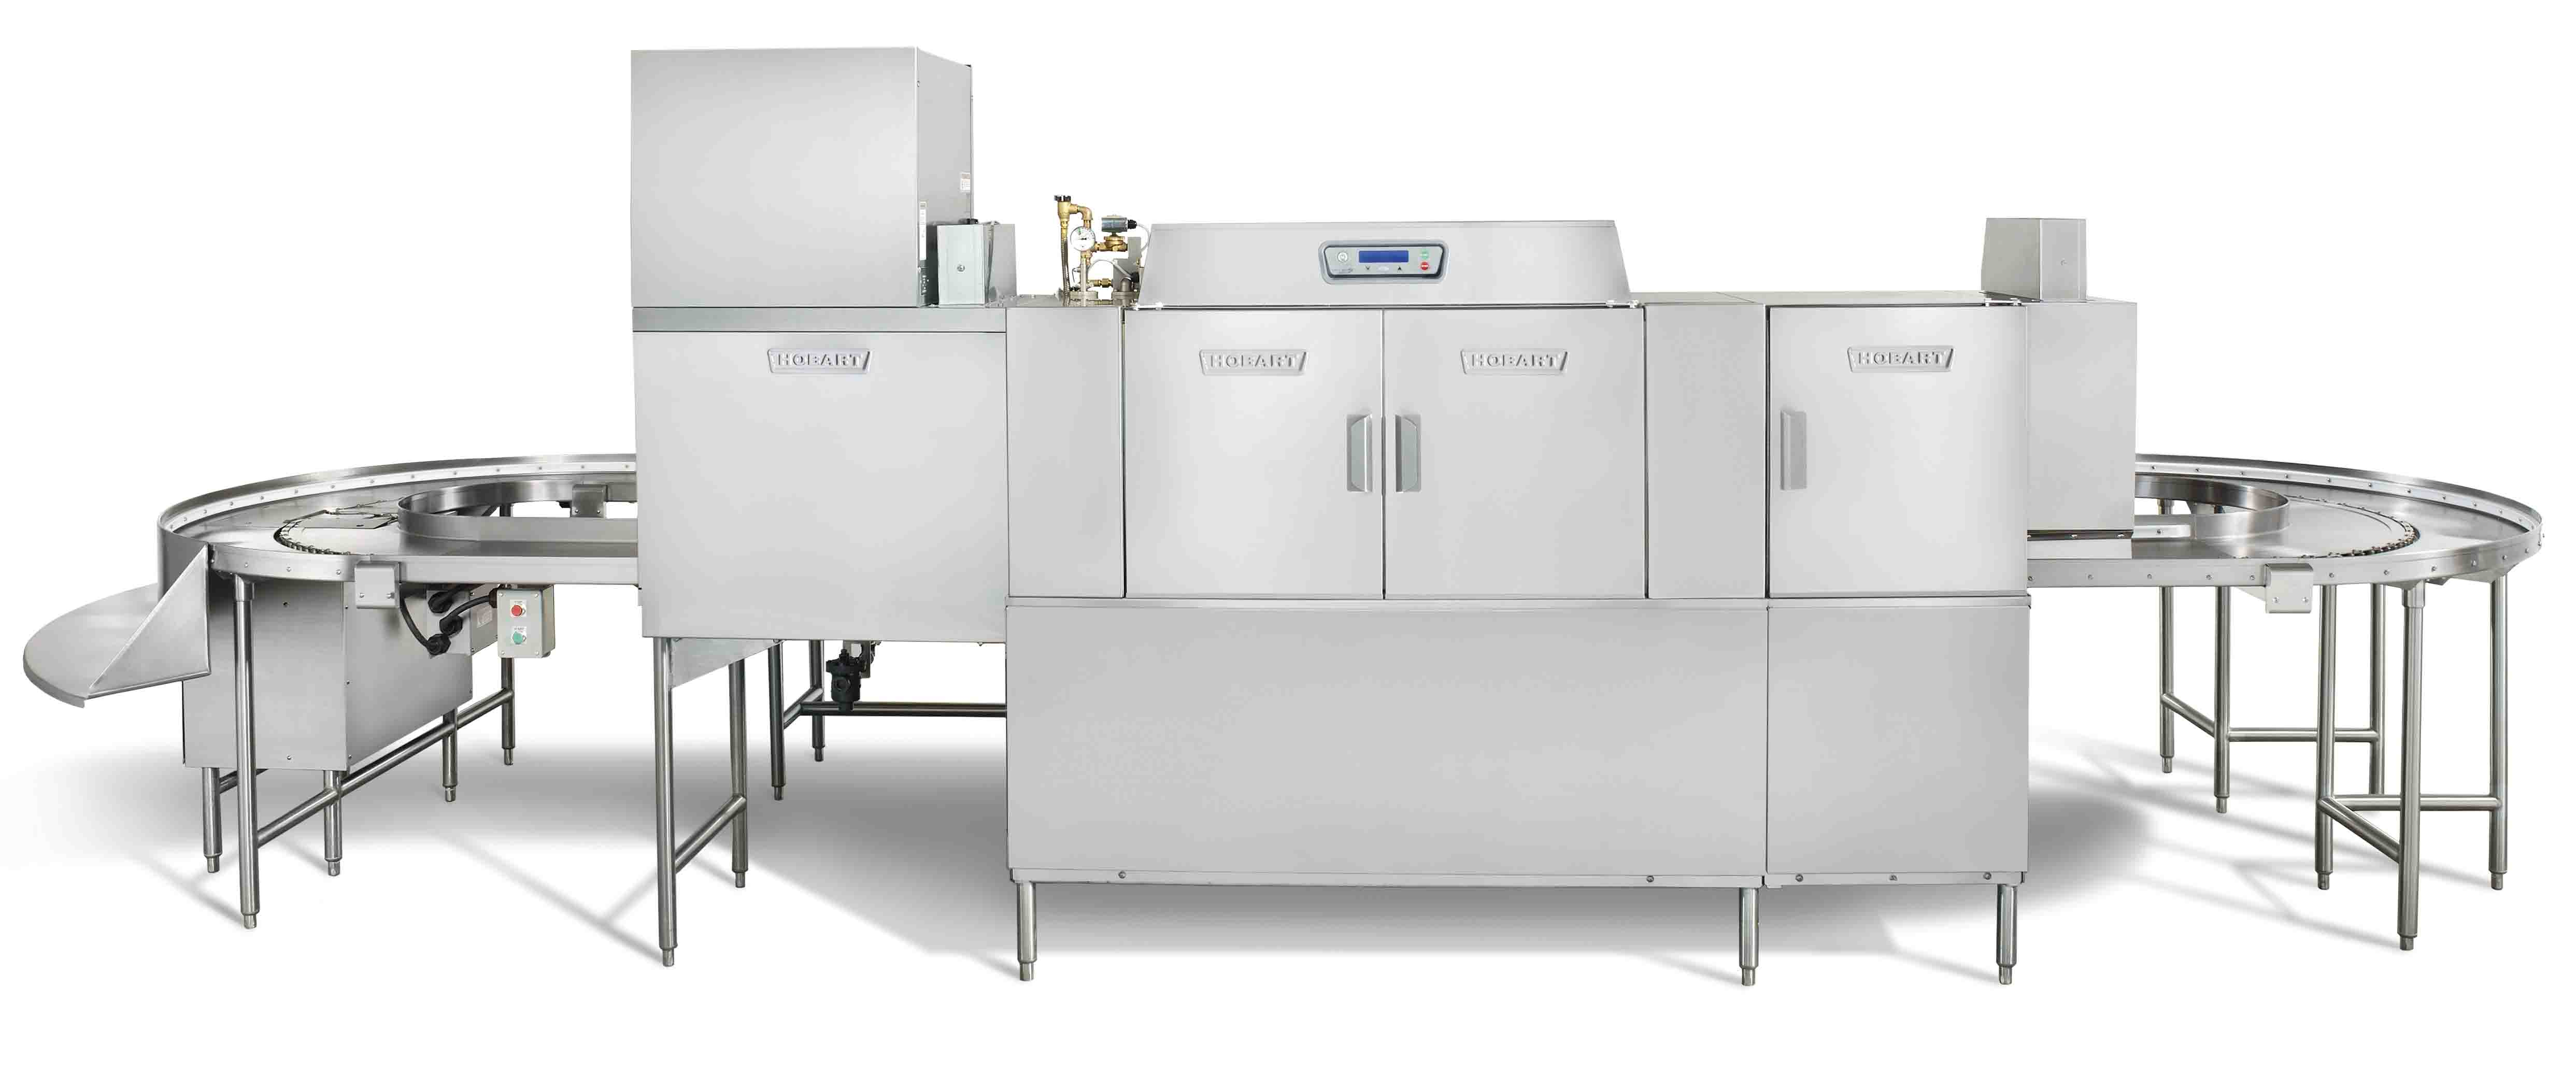 Warewasher System FRC F